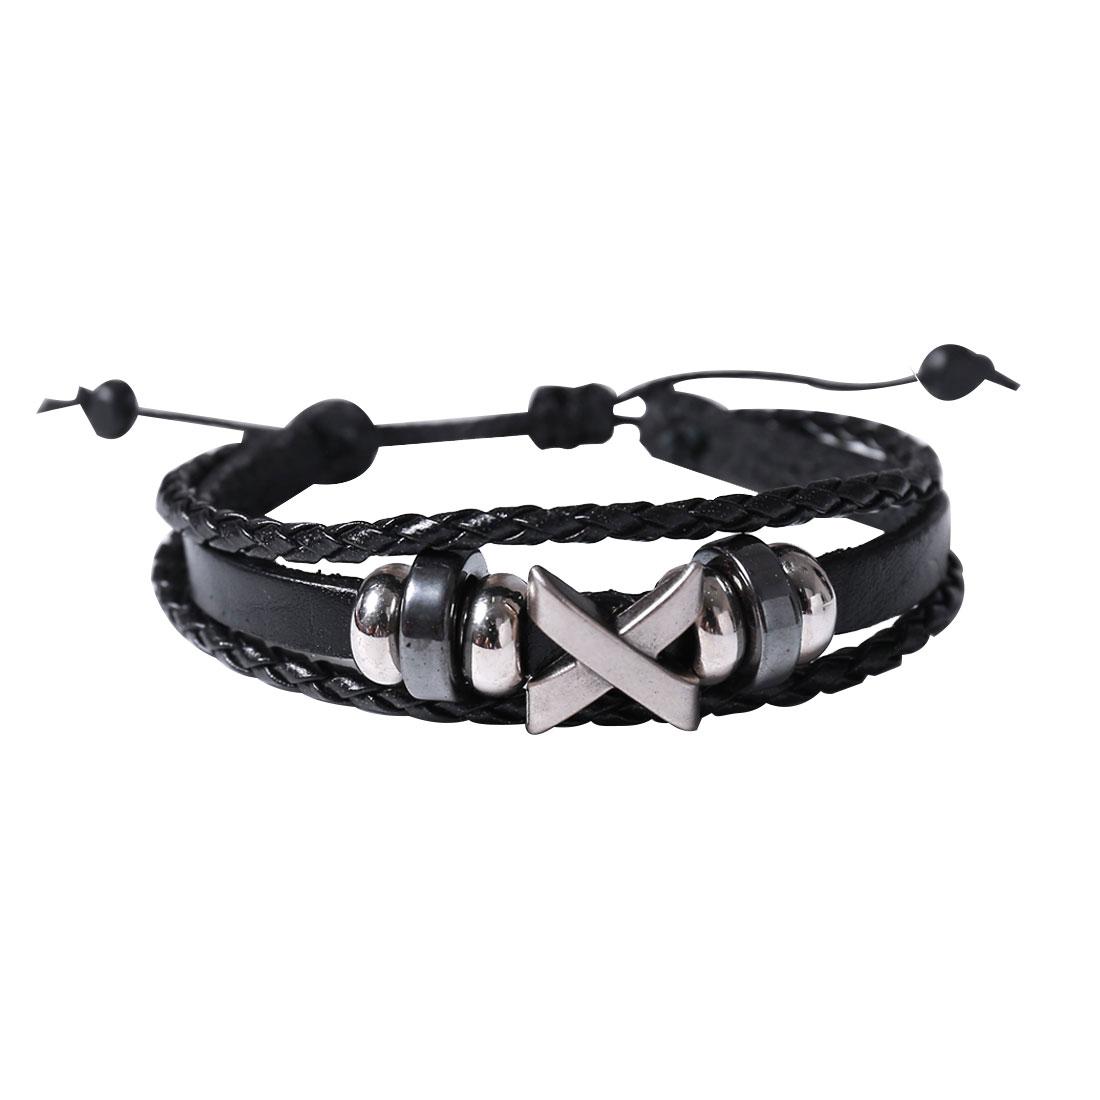 Punk Letter X Leather Charm Wrap Wristband Bracelet Bangle Cuff